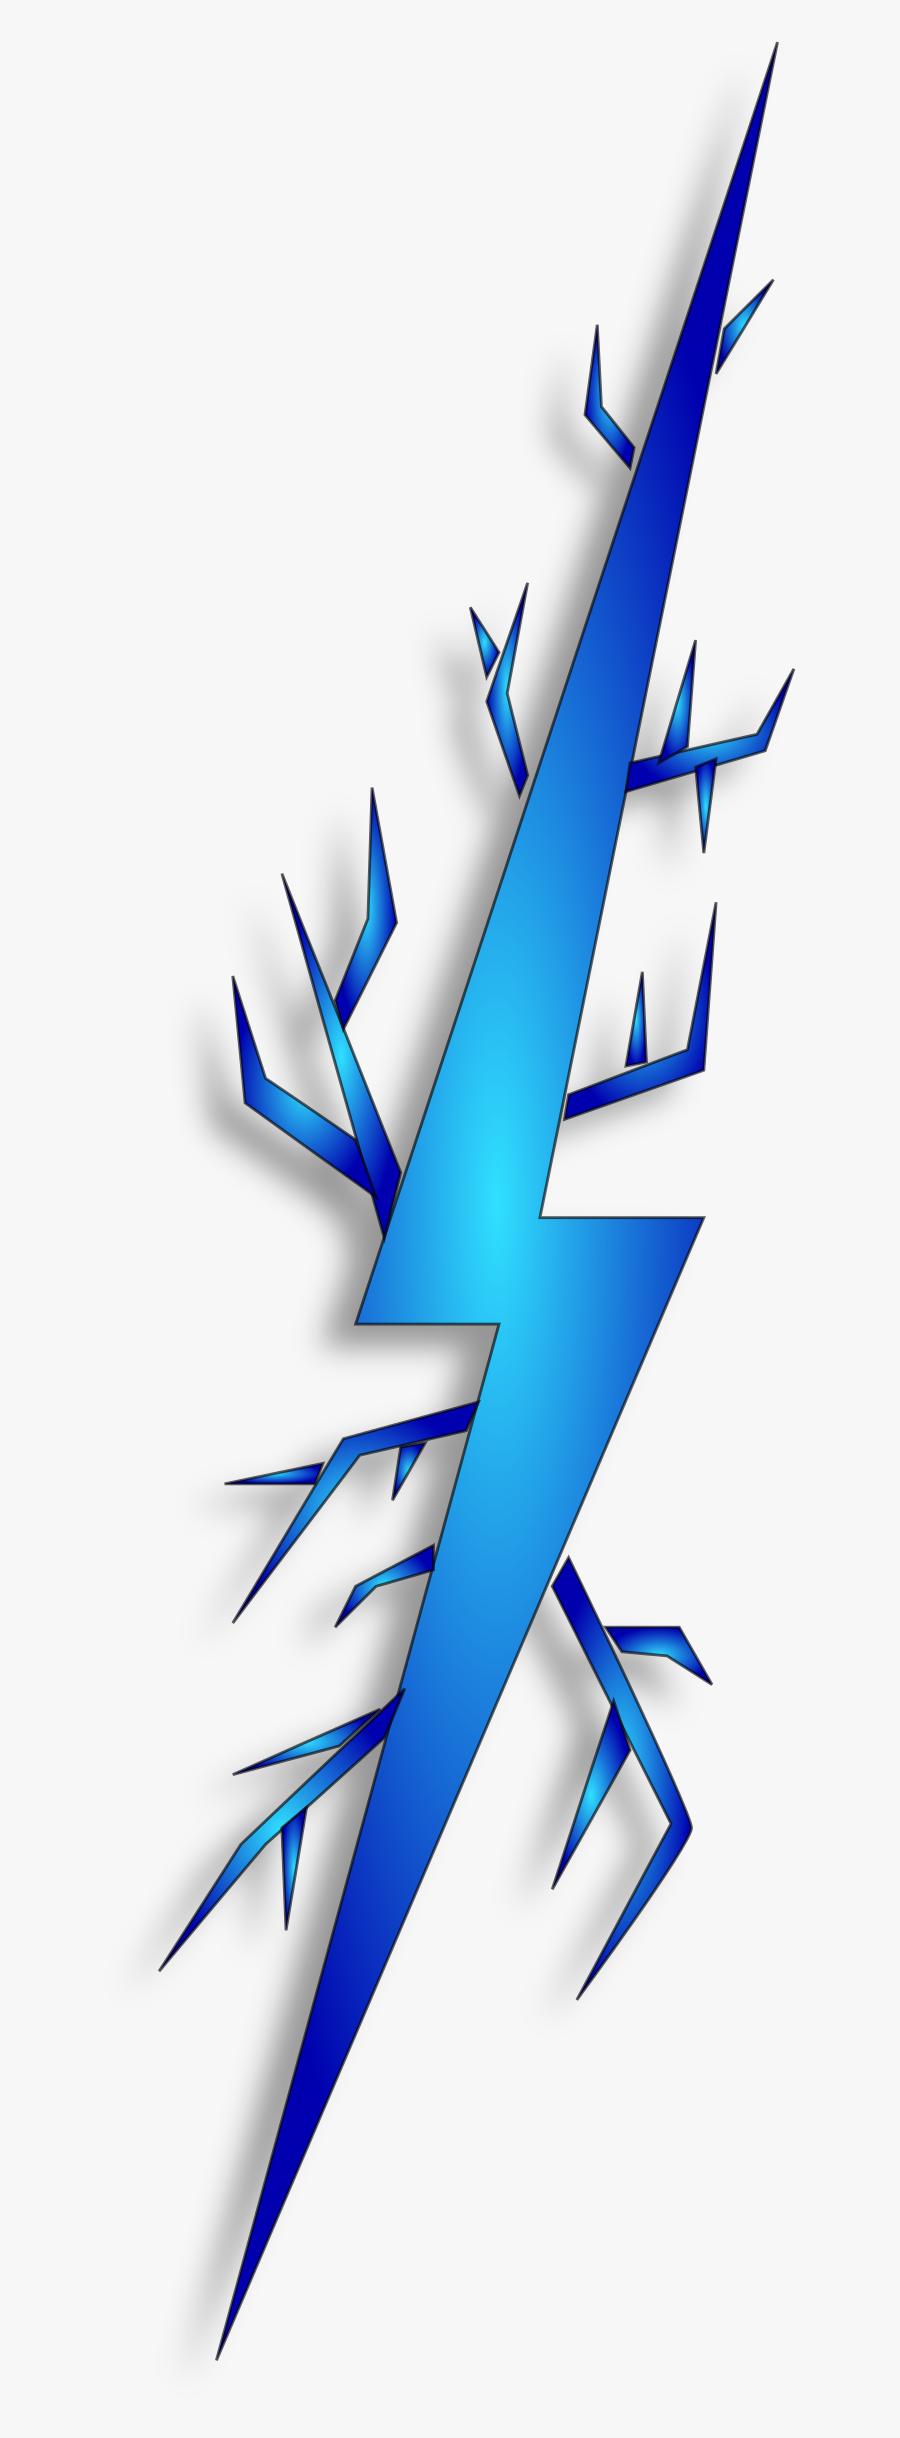 Electricity Clipart Lightning - Transparent Blue Lightning Bolt, Transparent Clipart